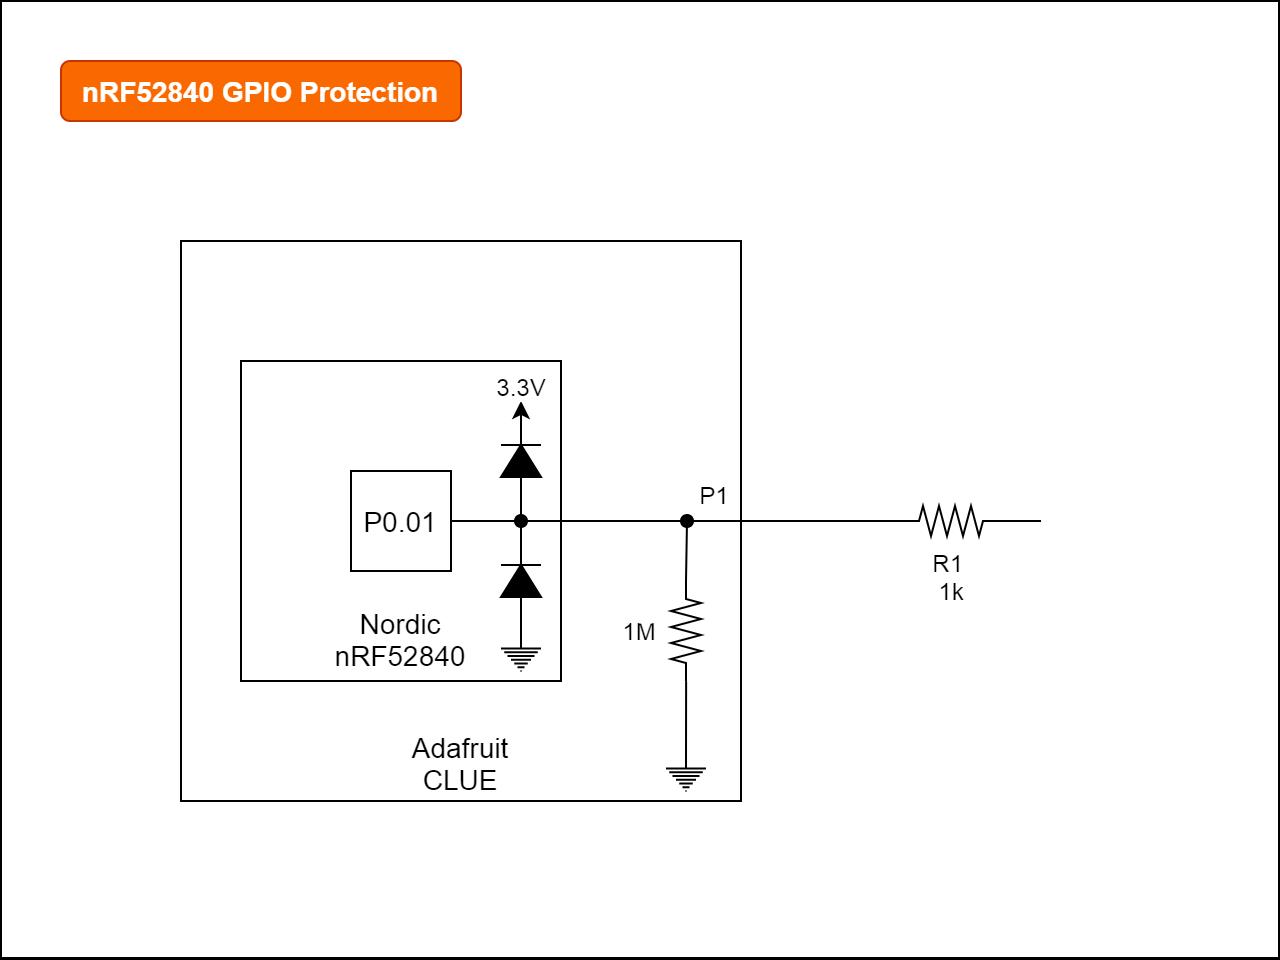 sensors_clue-nrf52840-gpio-pad-protection-v1.png